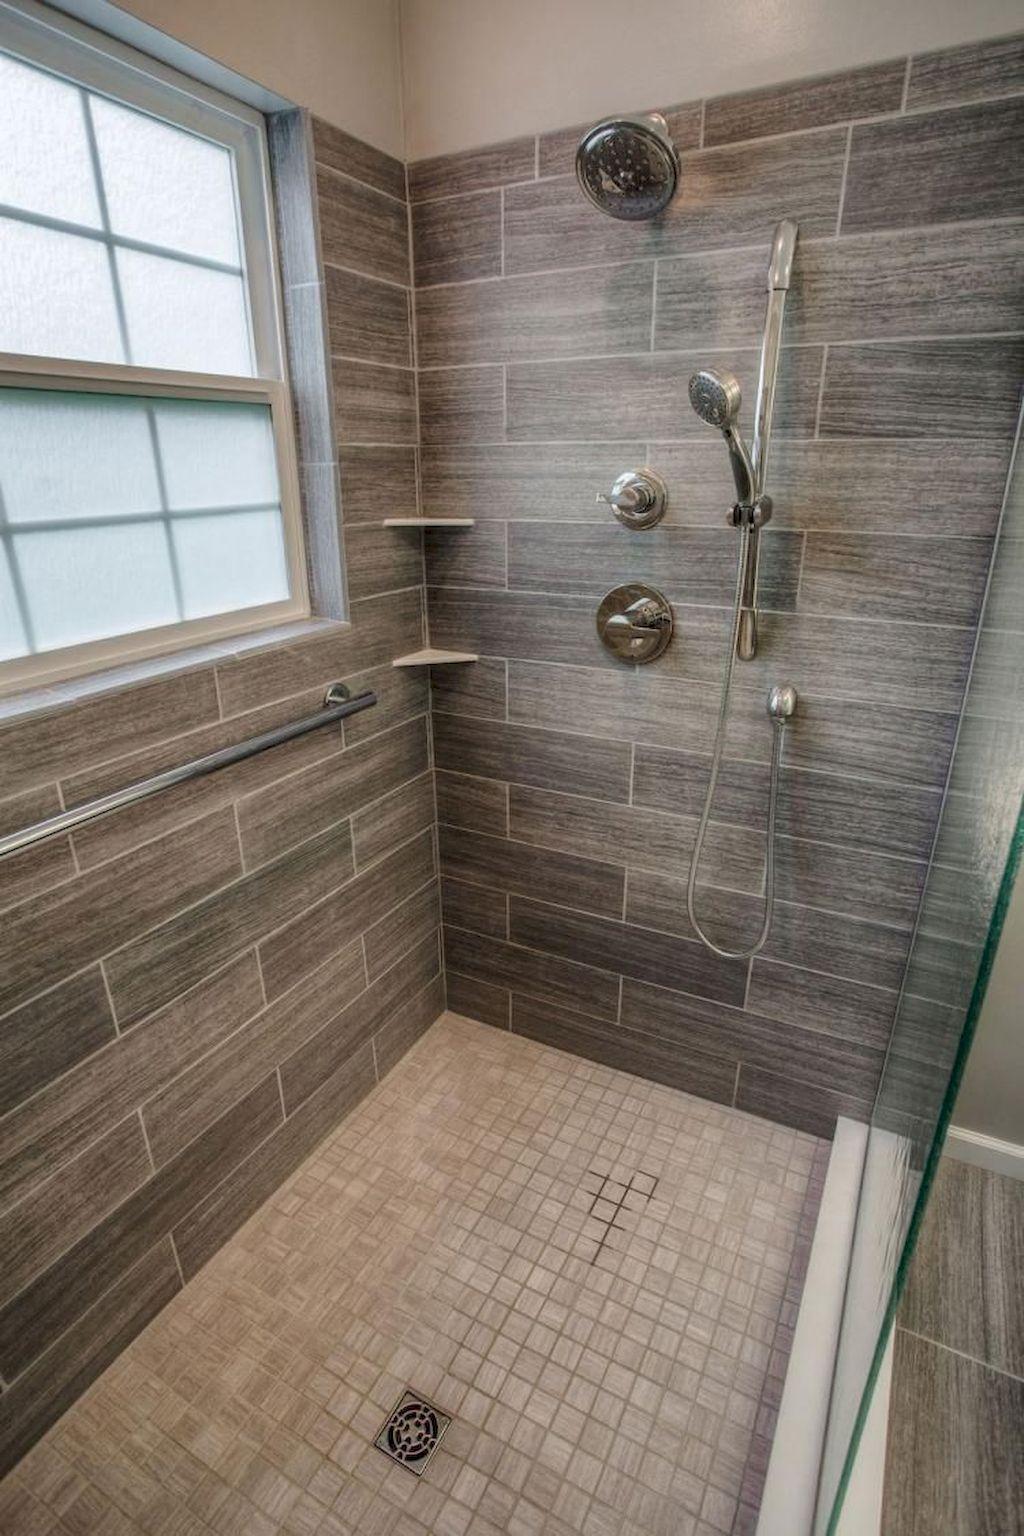 Gorgeous 90 Insane Rustic Farmhouse Shower Tile Remodel Ideas Farmhouse Rustic Shower Tile Bathroom Remodel Shower Shower Remodel Bathroom Remodel Master